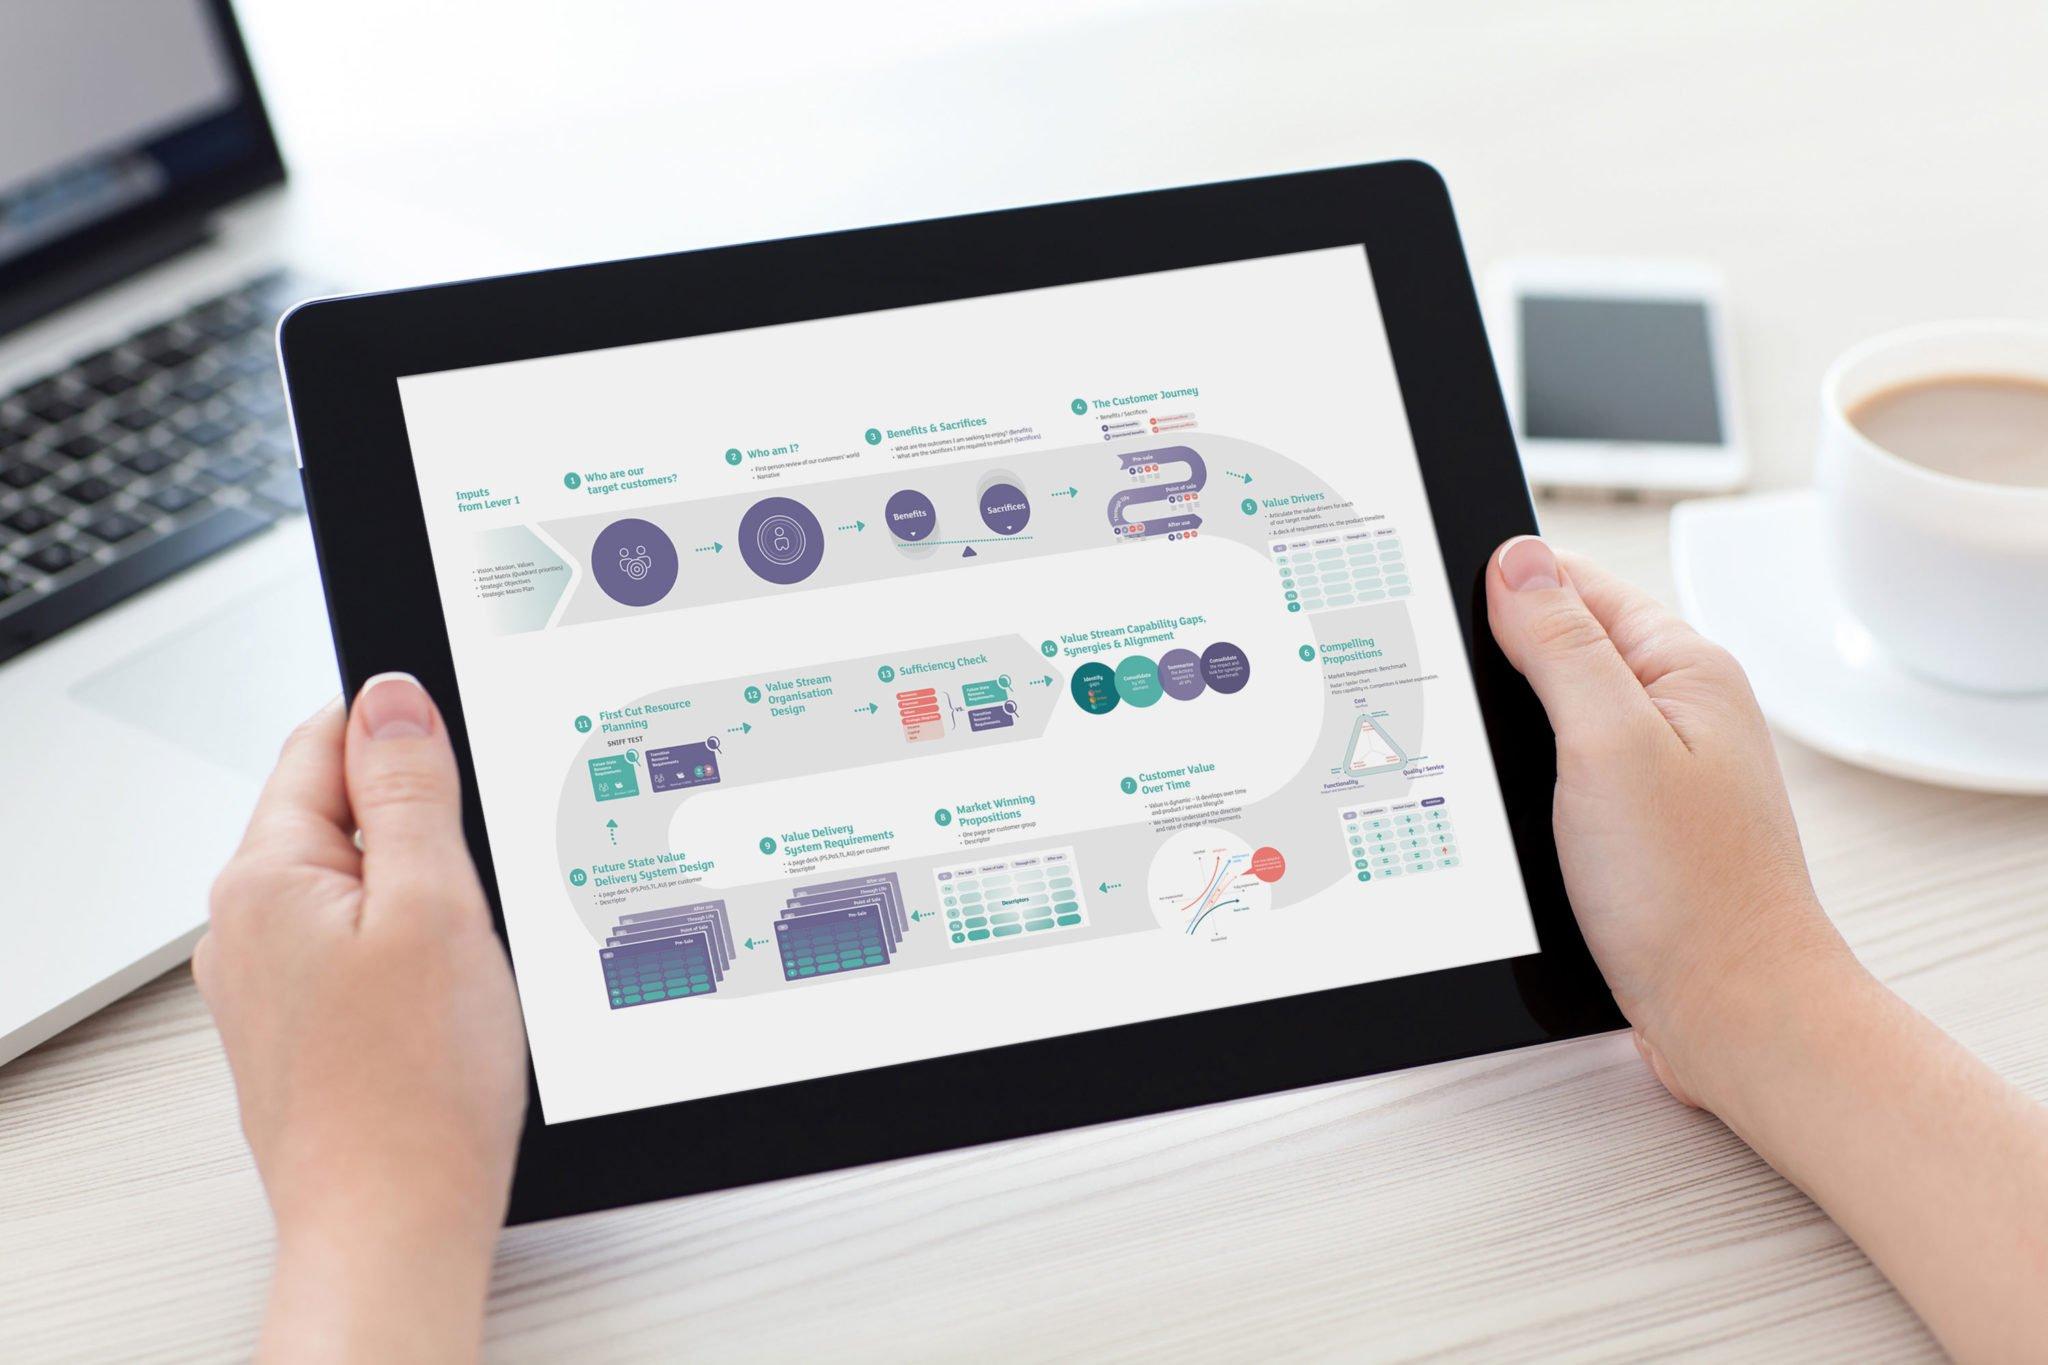 digital-creative-app-strategy-wlw-future-essex-london-2